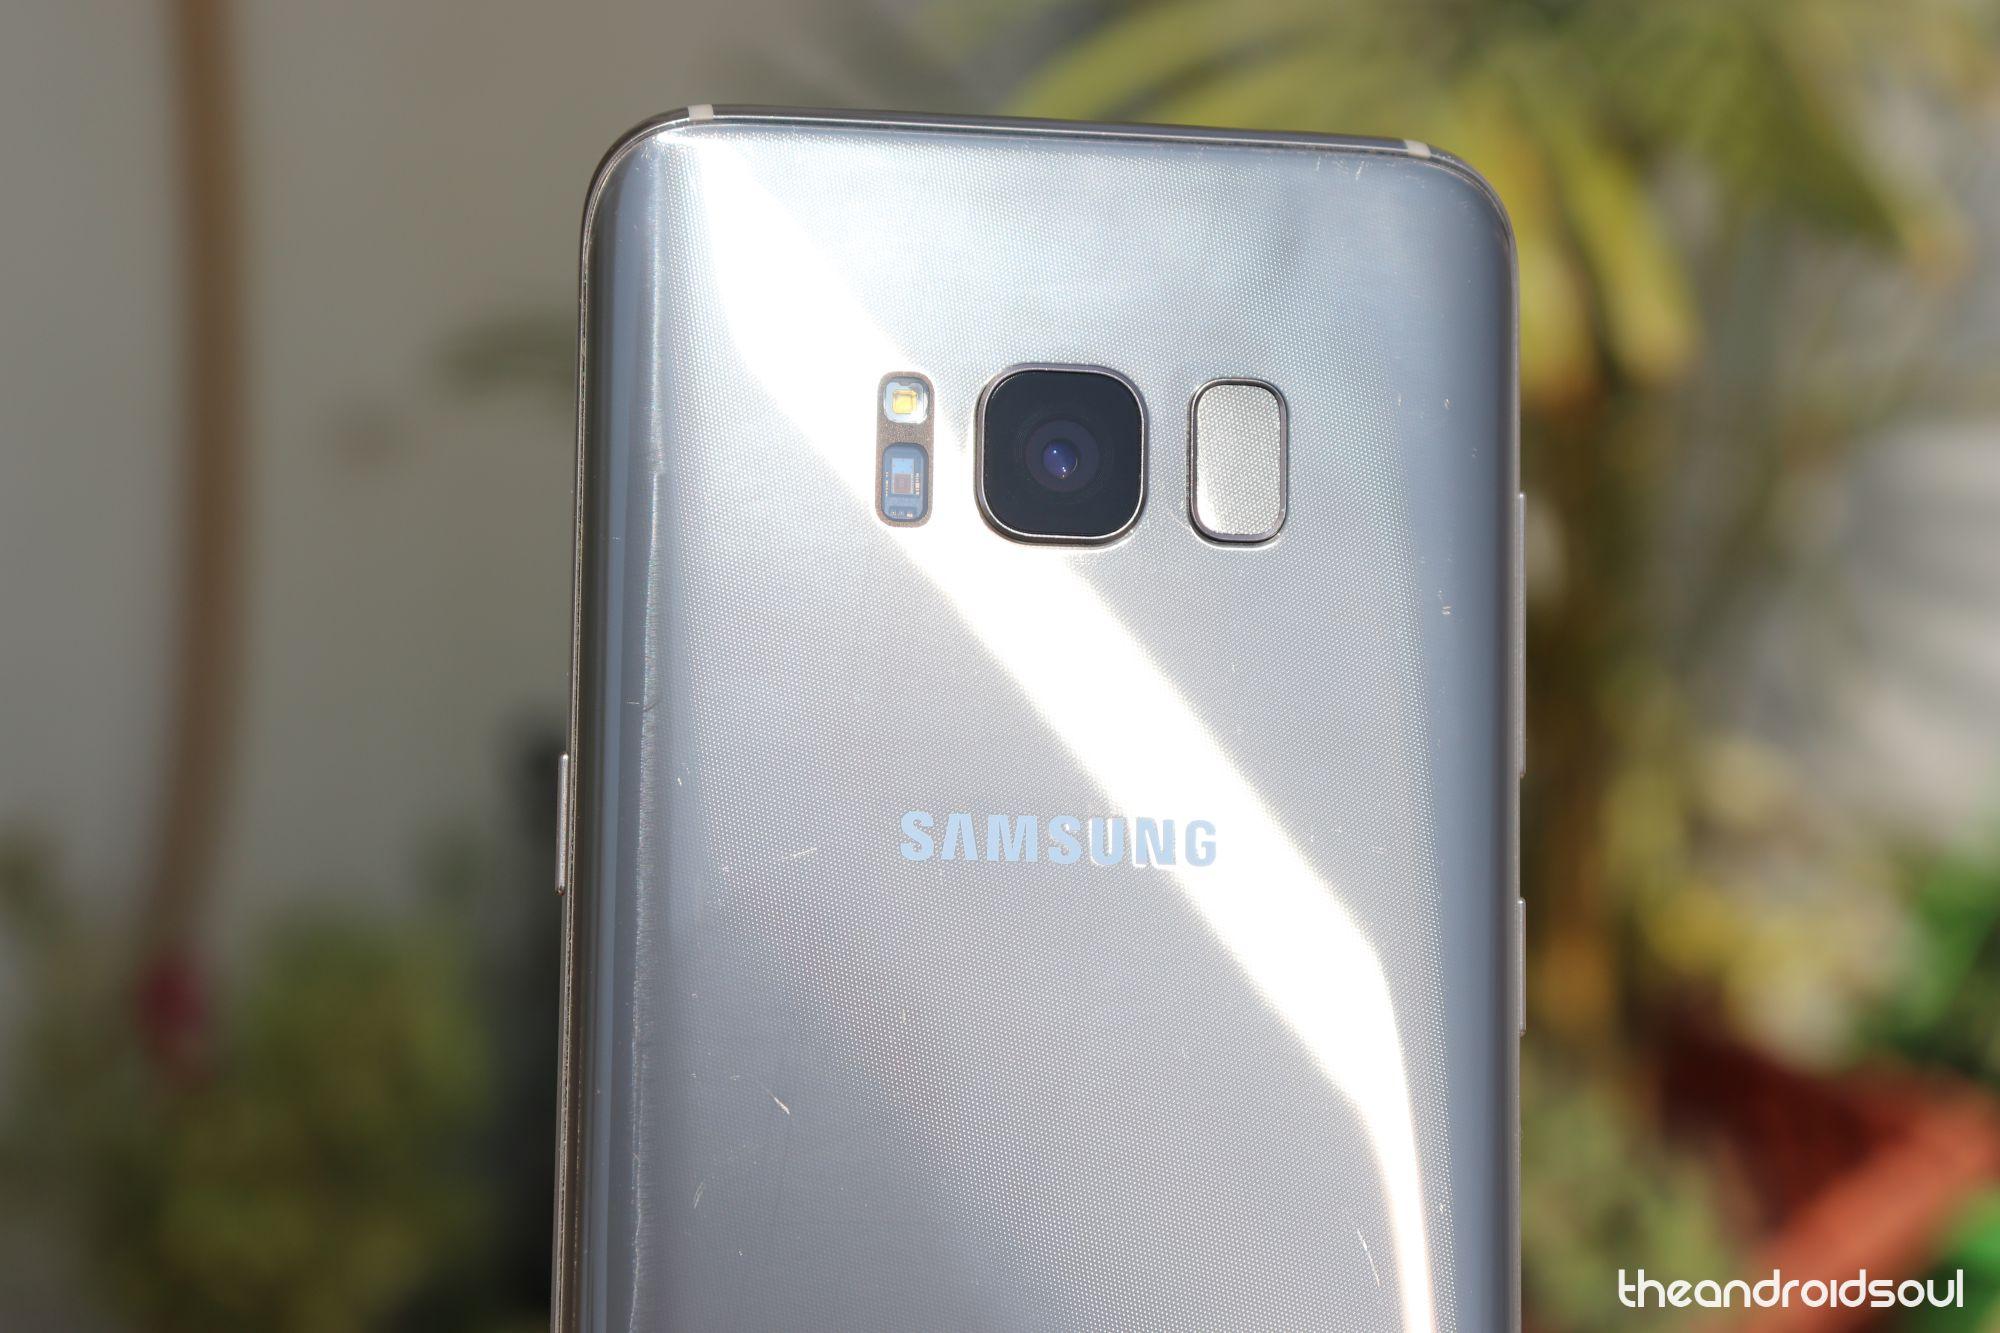 Galaxy S8 smartphone